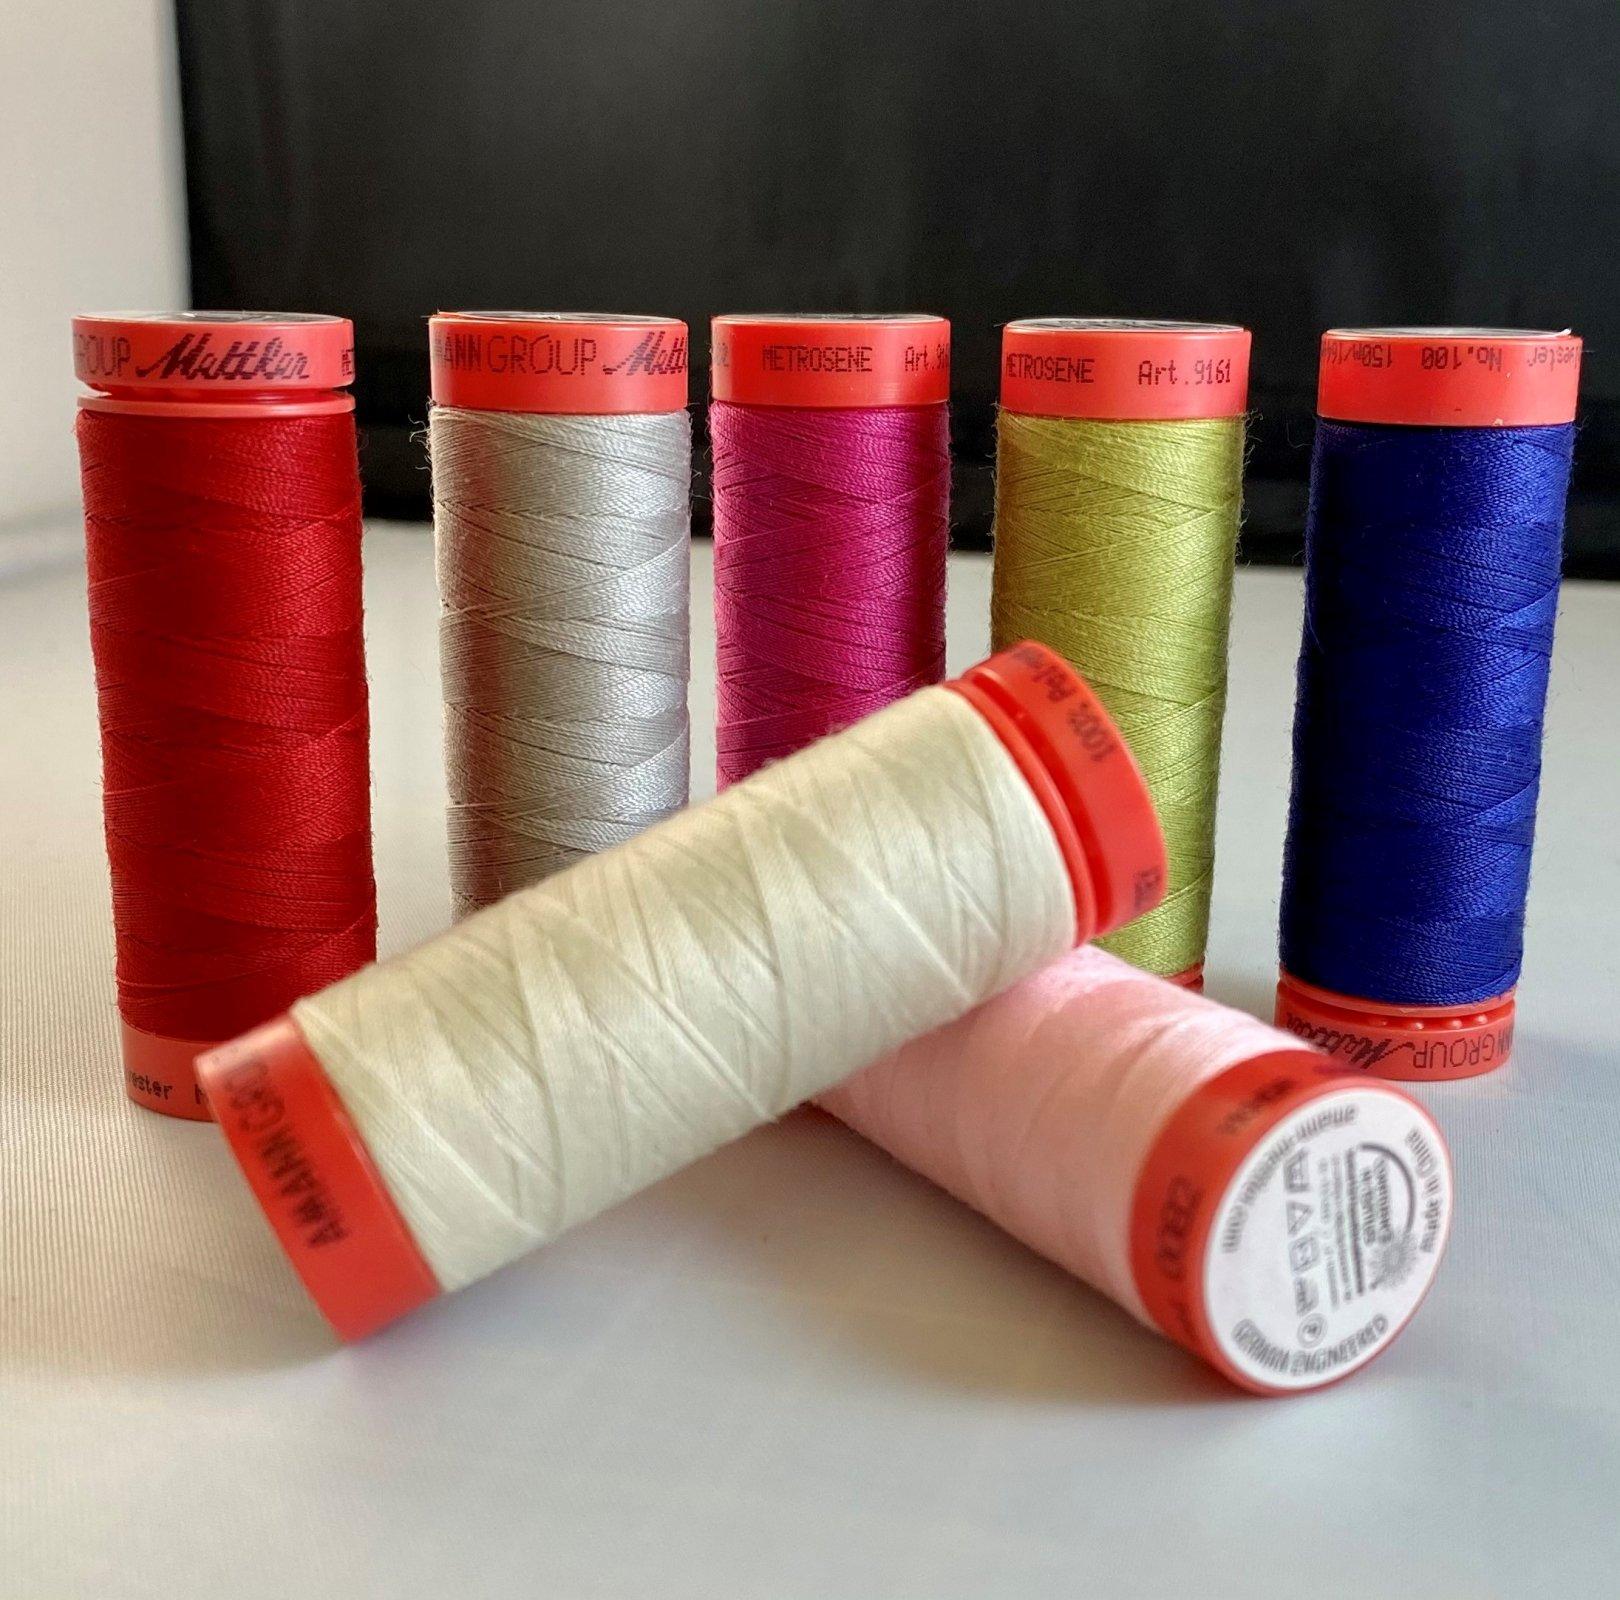 Mettler Metrosene Thread 164 yards - 100% Polyester